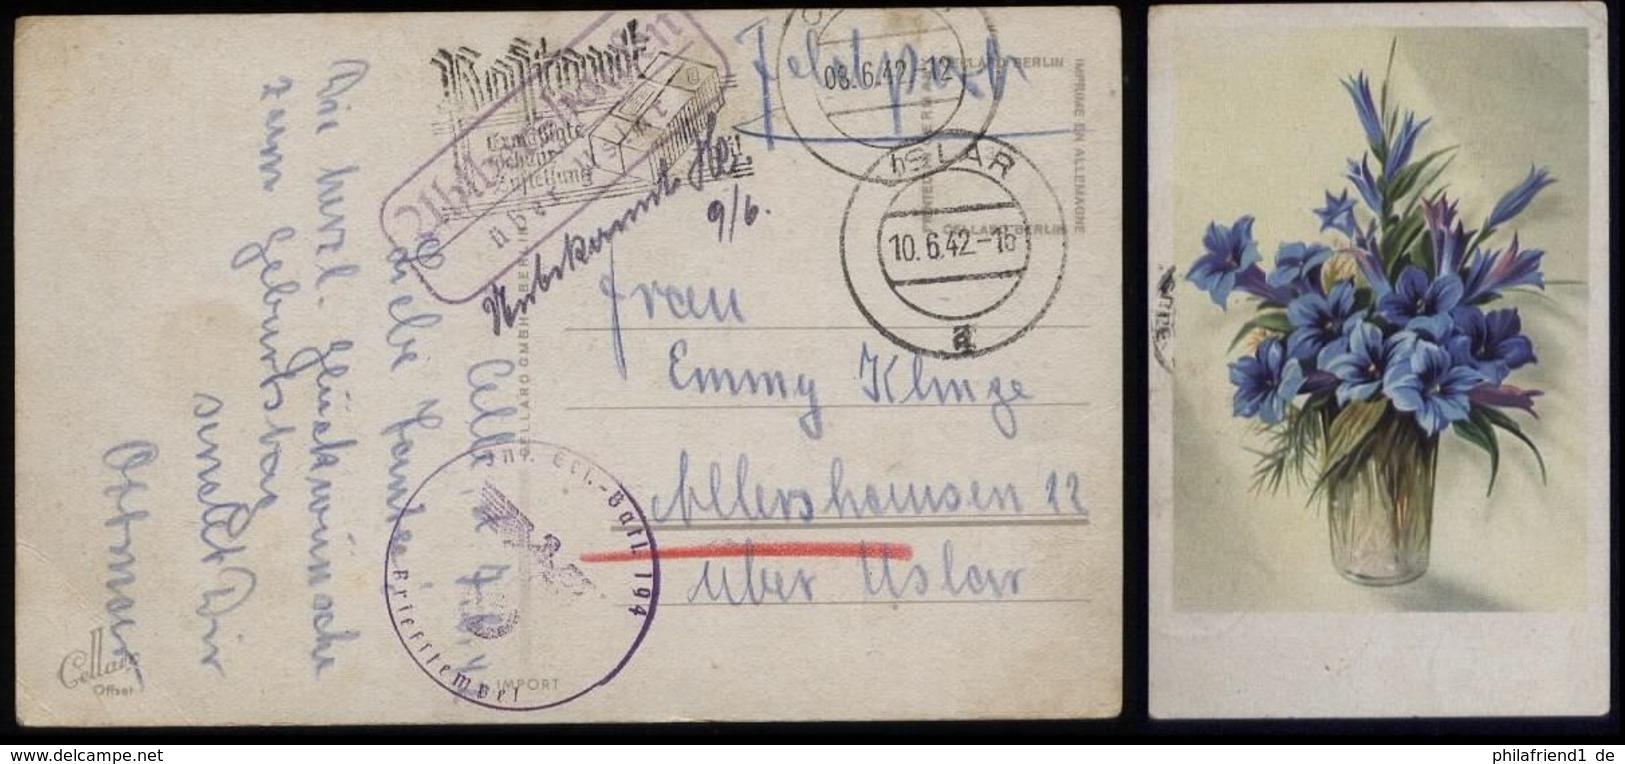 P0113 - DR Propaganda Postkarte Enzian Mit Landpoststempel : Gebraucht Mit Feldpost Ahlbershausen über Uslar - Allersh - Germany